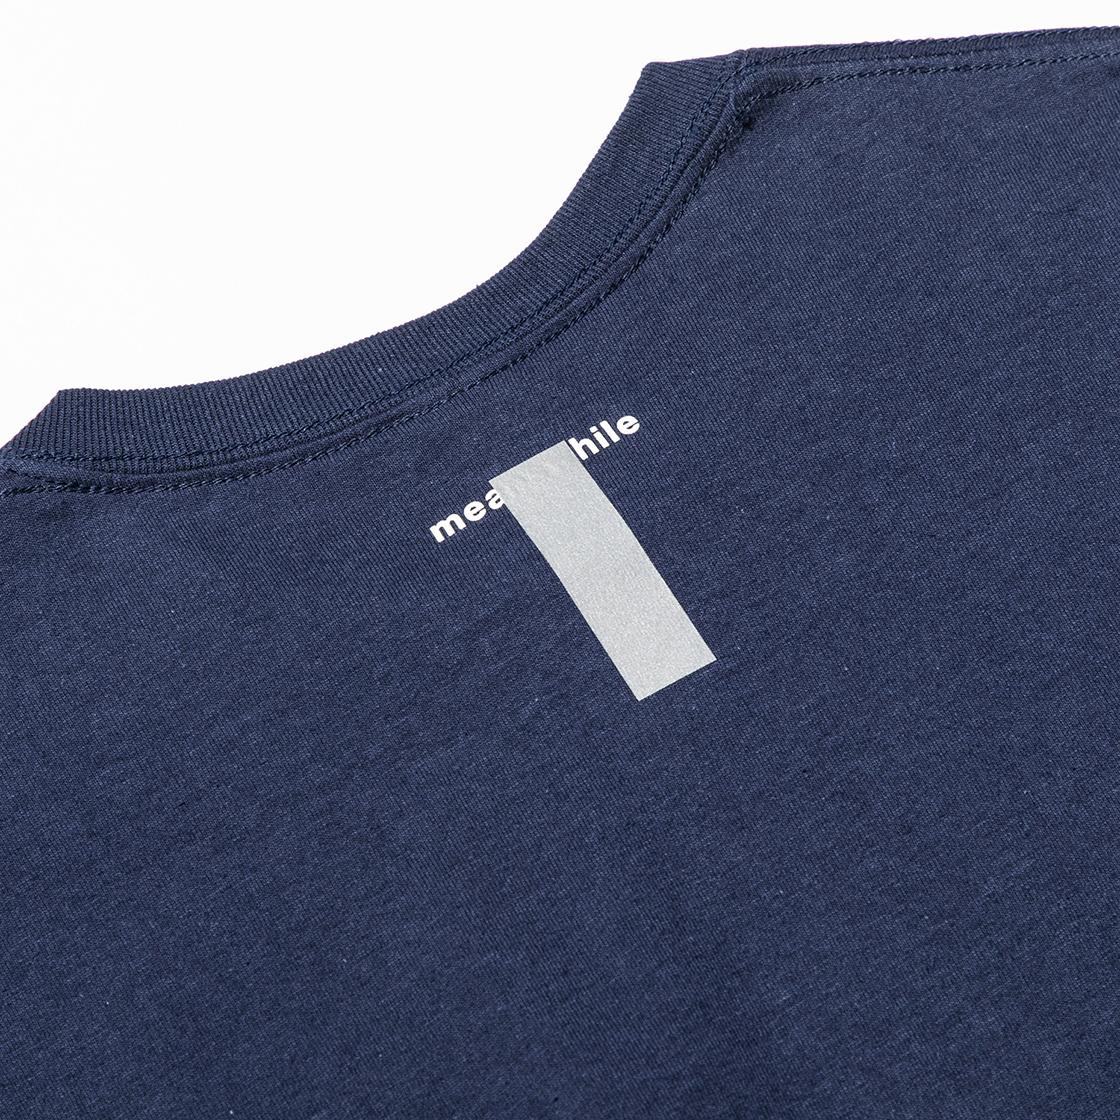 Lenticular Reflect Logo Tee Navy